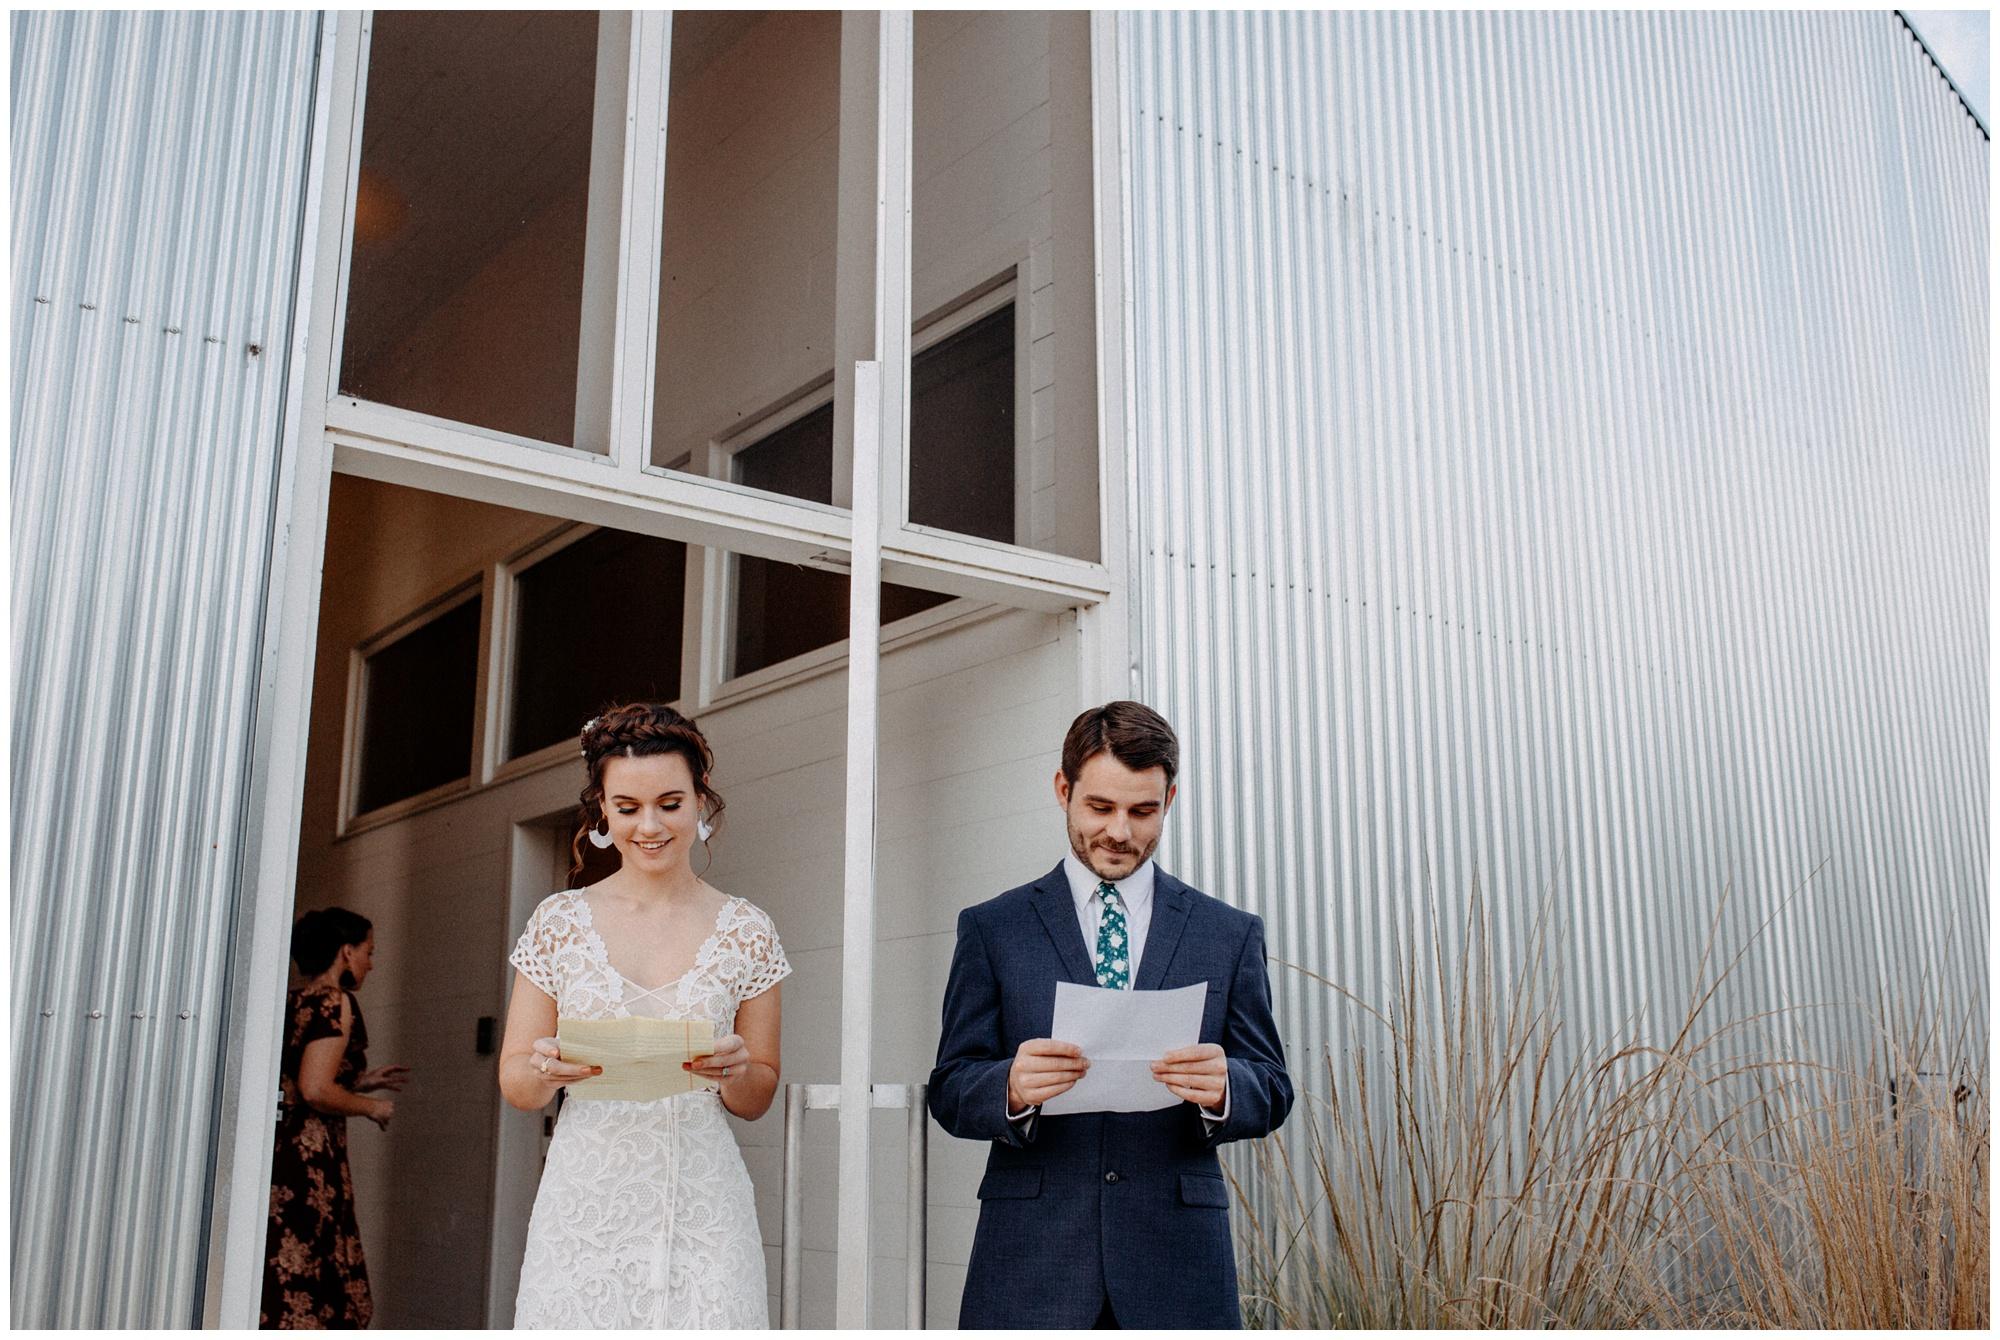 AUSTIN-TEXAS-PROSPECT-HOUSE-WEDDING-VENUE-PHOTOGRAPHY25763.JPG